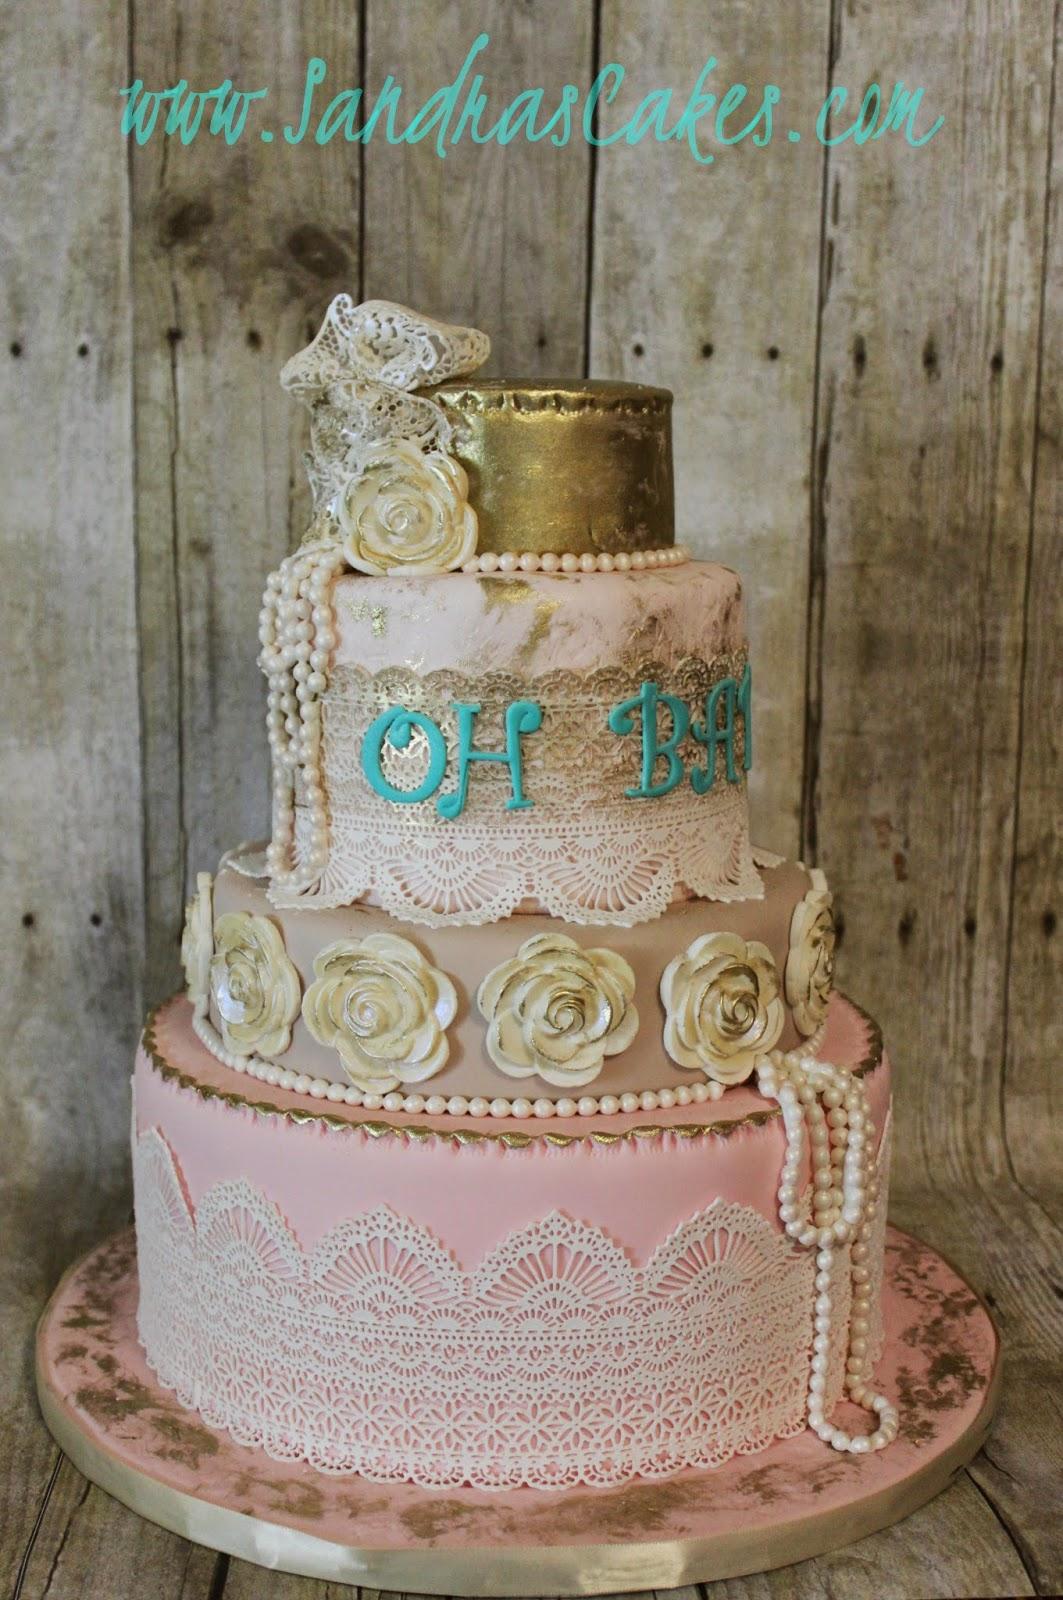 Cake Design Vintage : Vintage Shabby Chic Baby Shower Cake